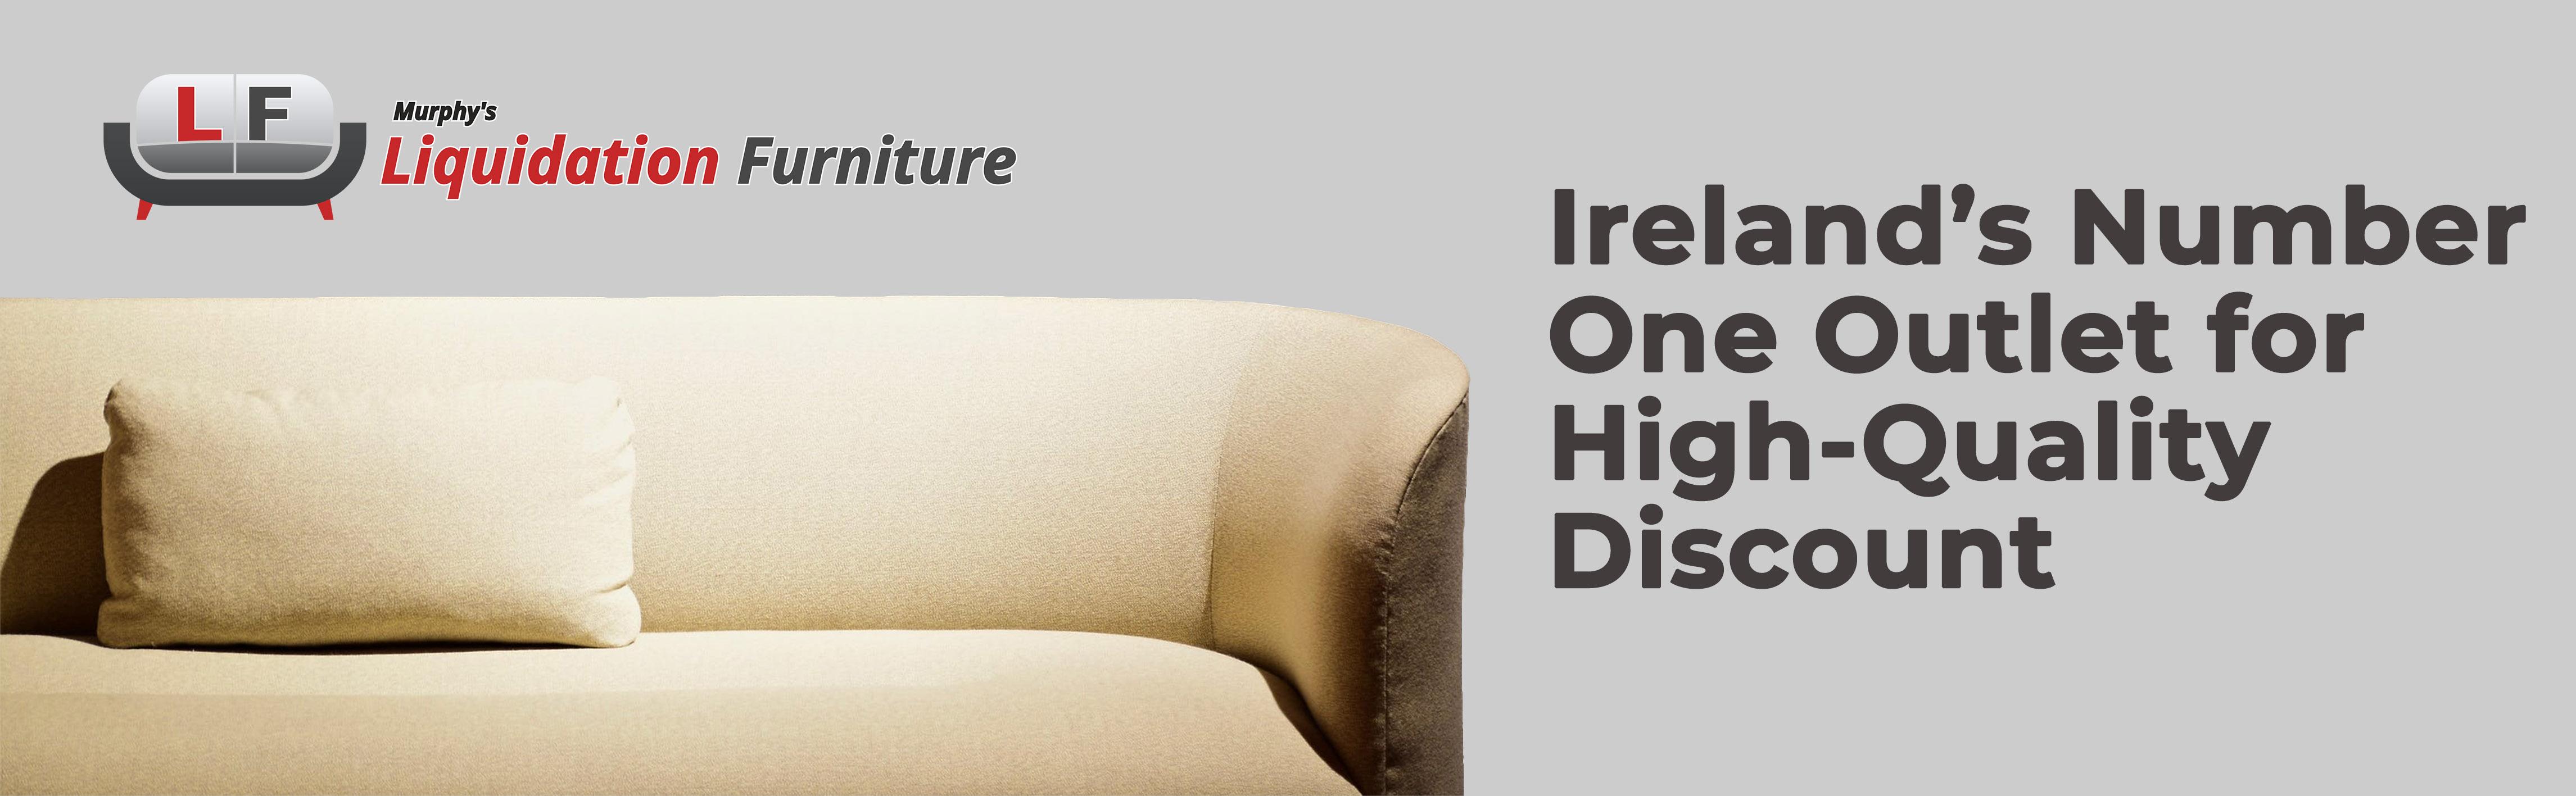 furniture online, furniture dublin, mattresses online